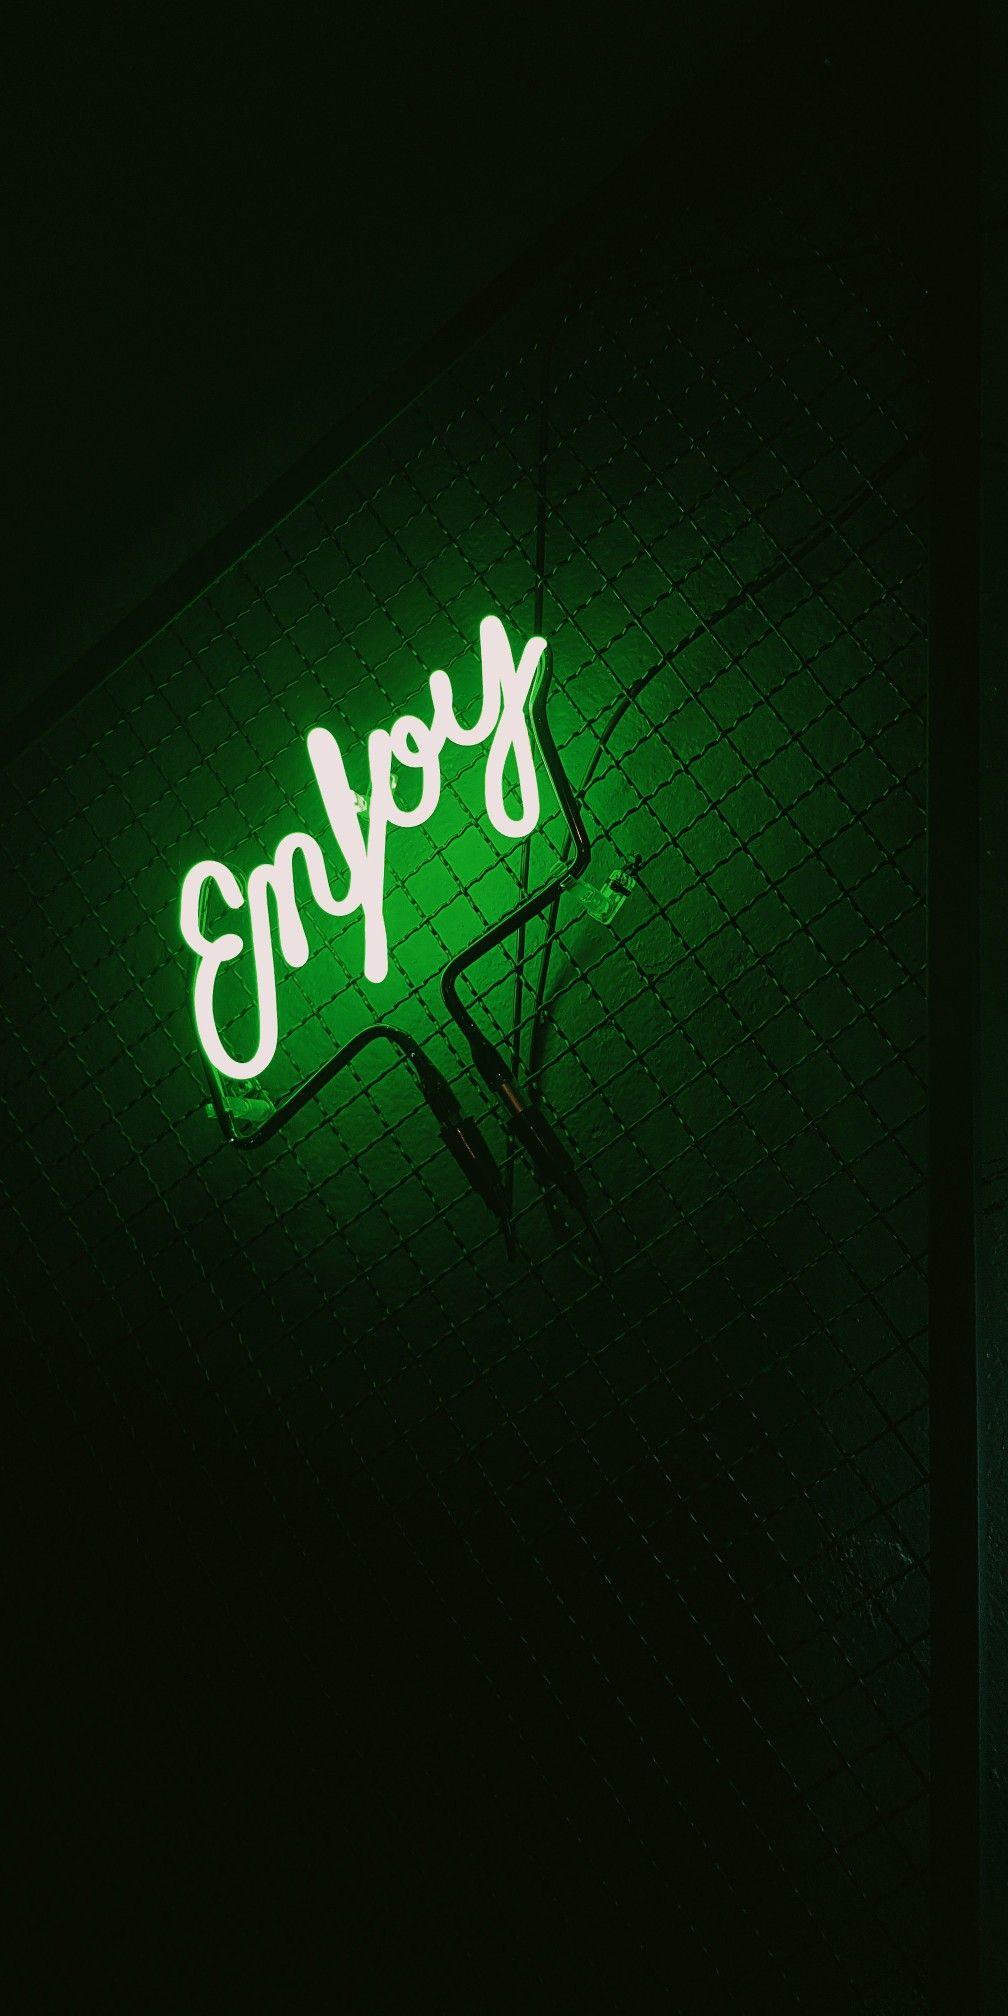 Dark Green Aesthetic Quotes